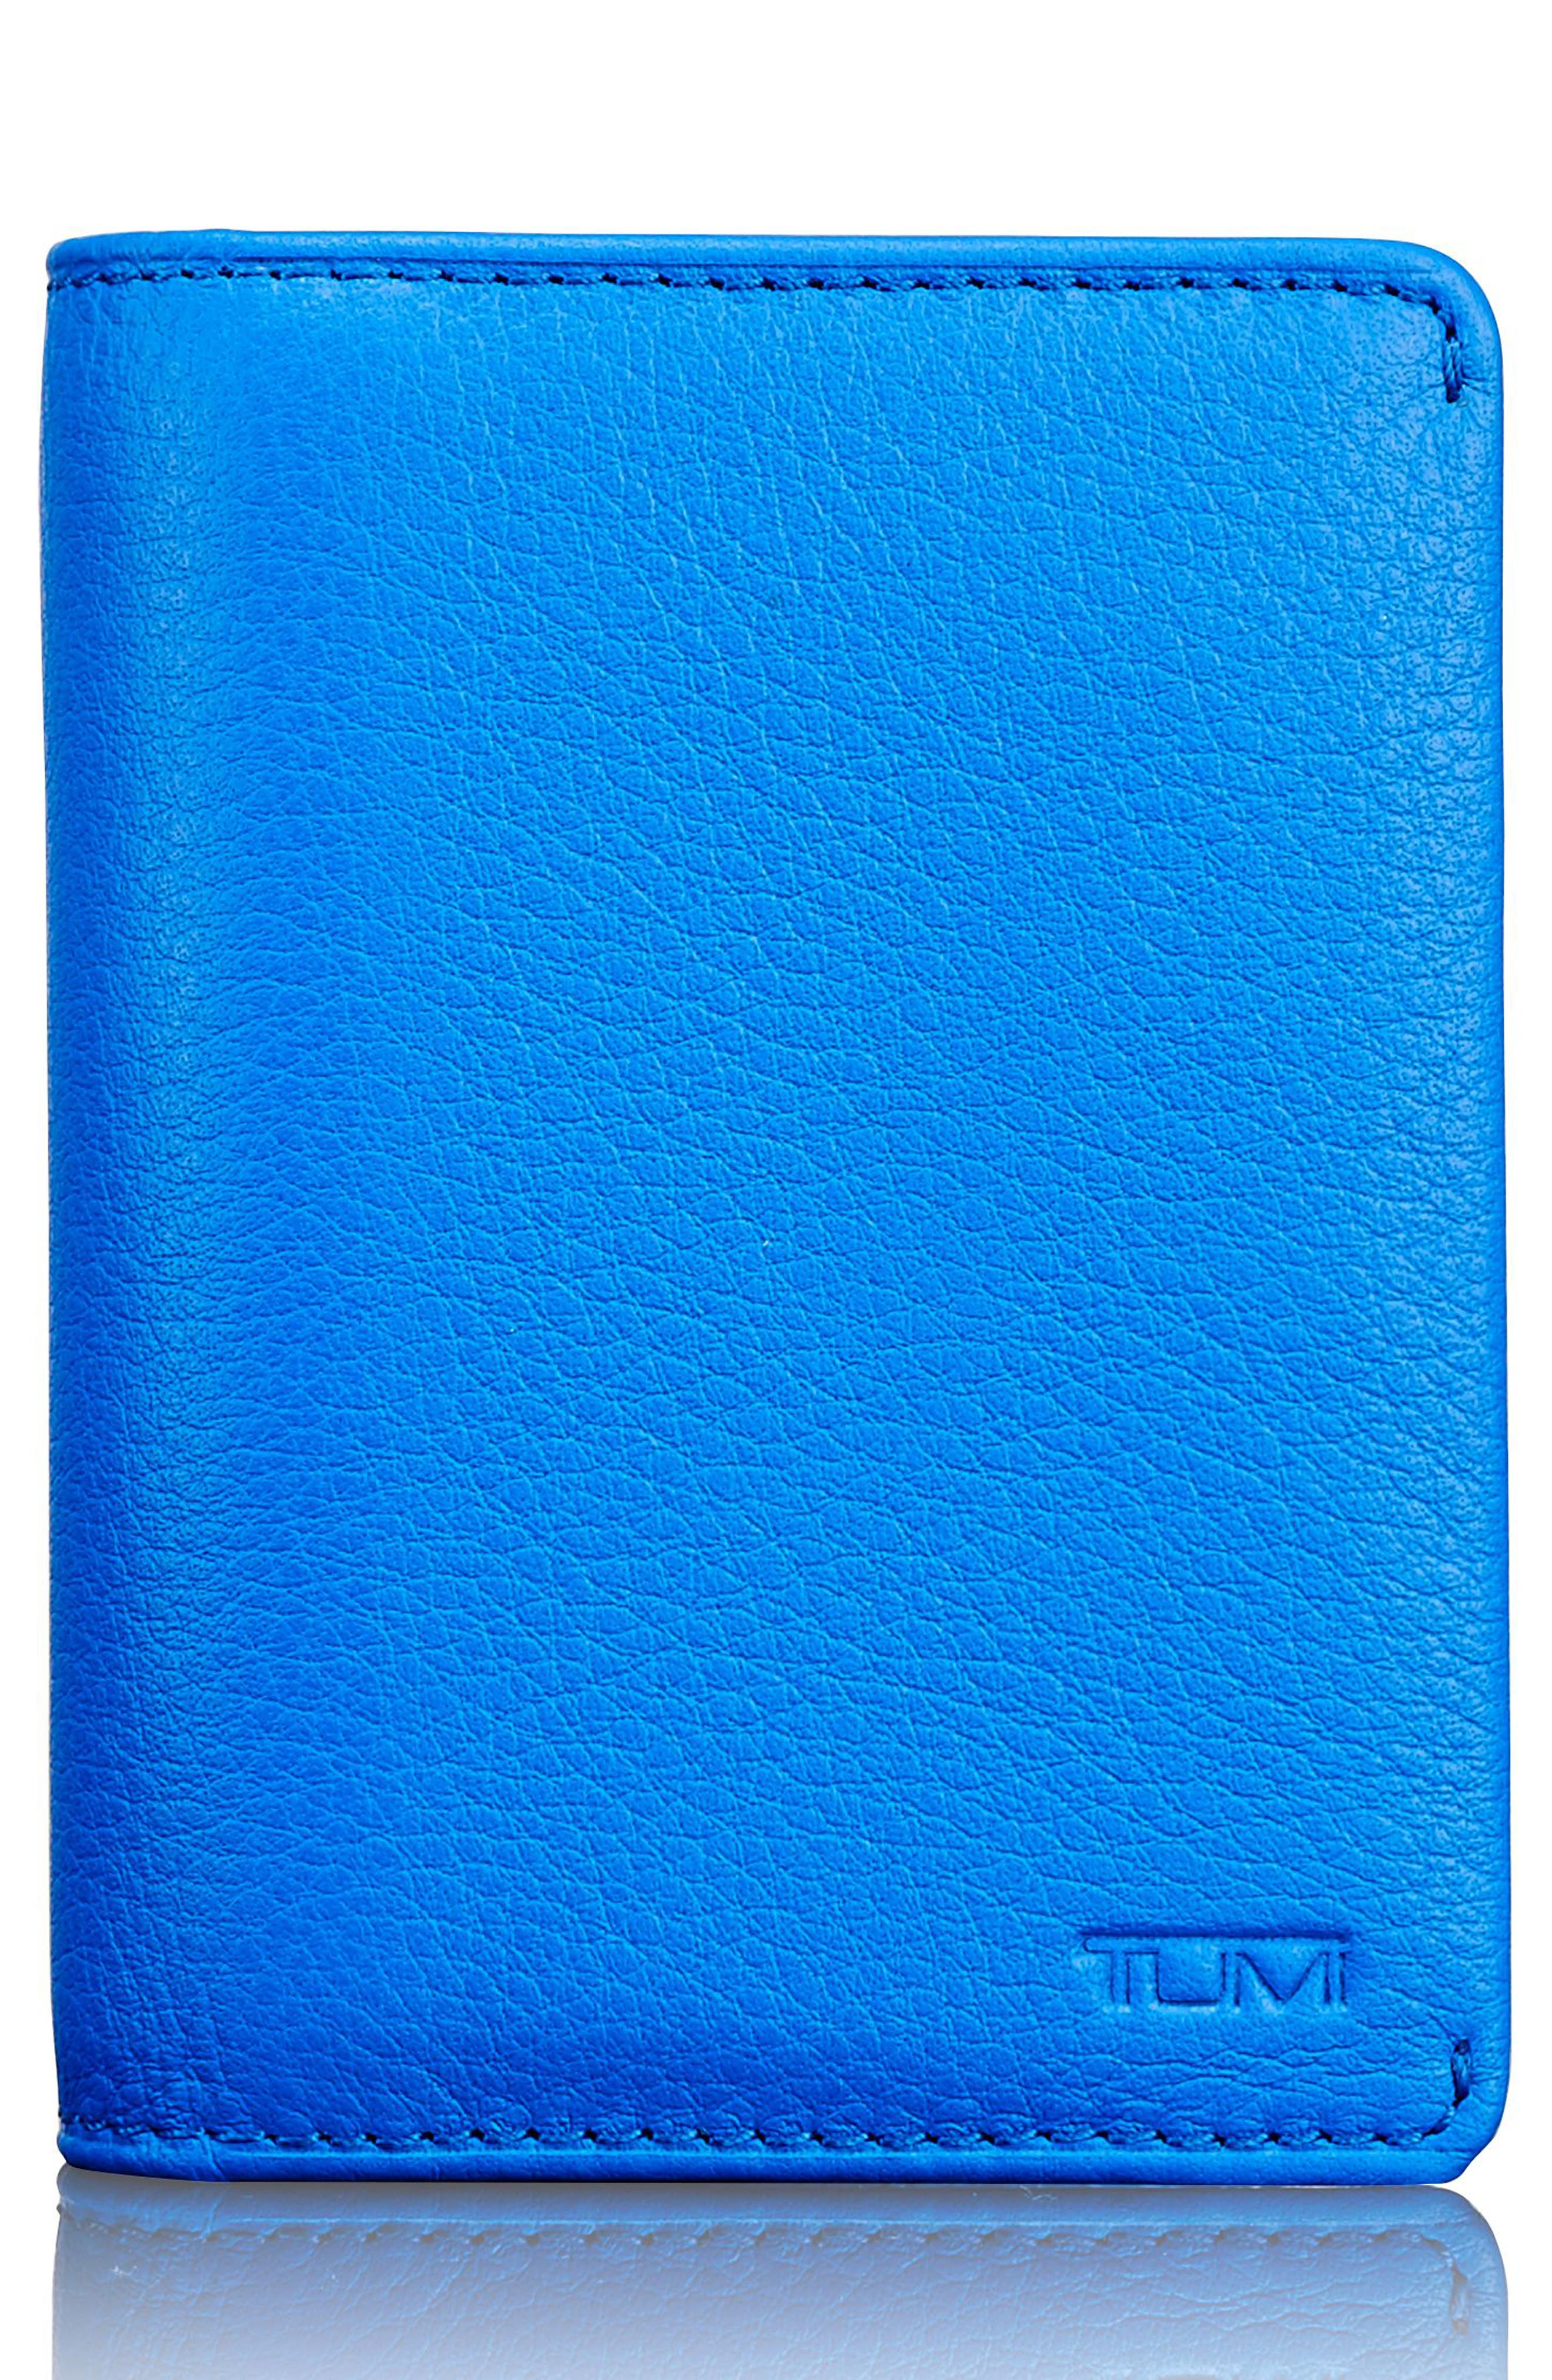 Alternate Image 1 Selected - Tumi Leather RFID Card Case